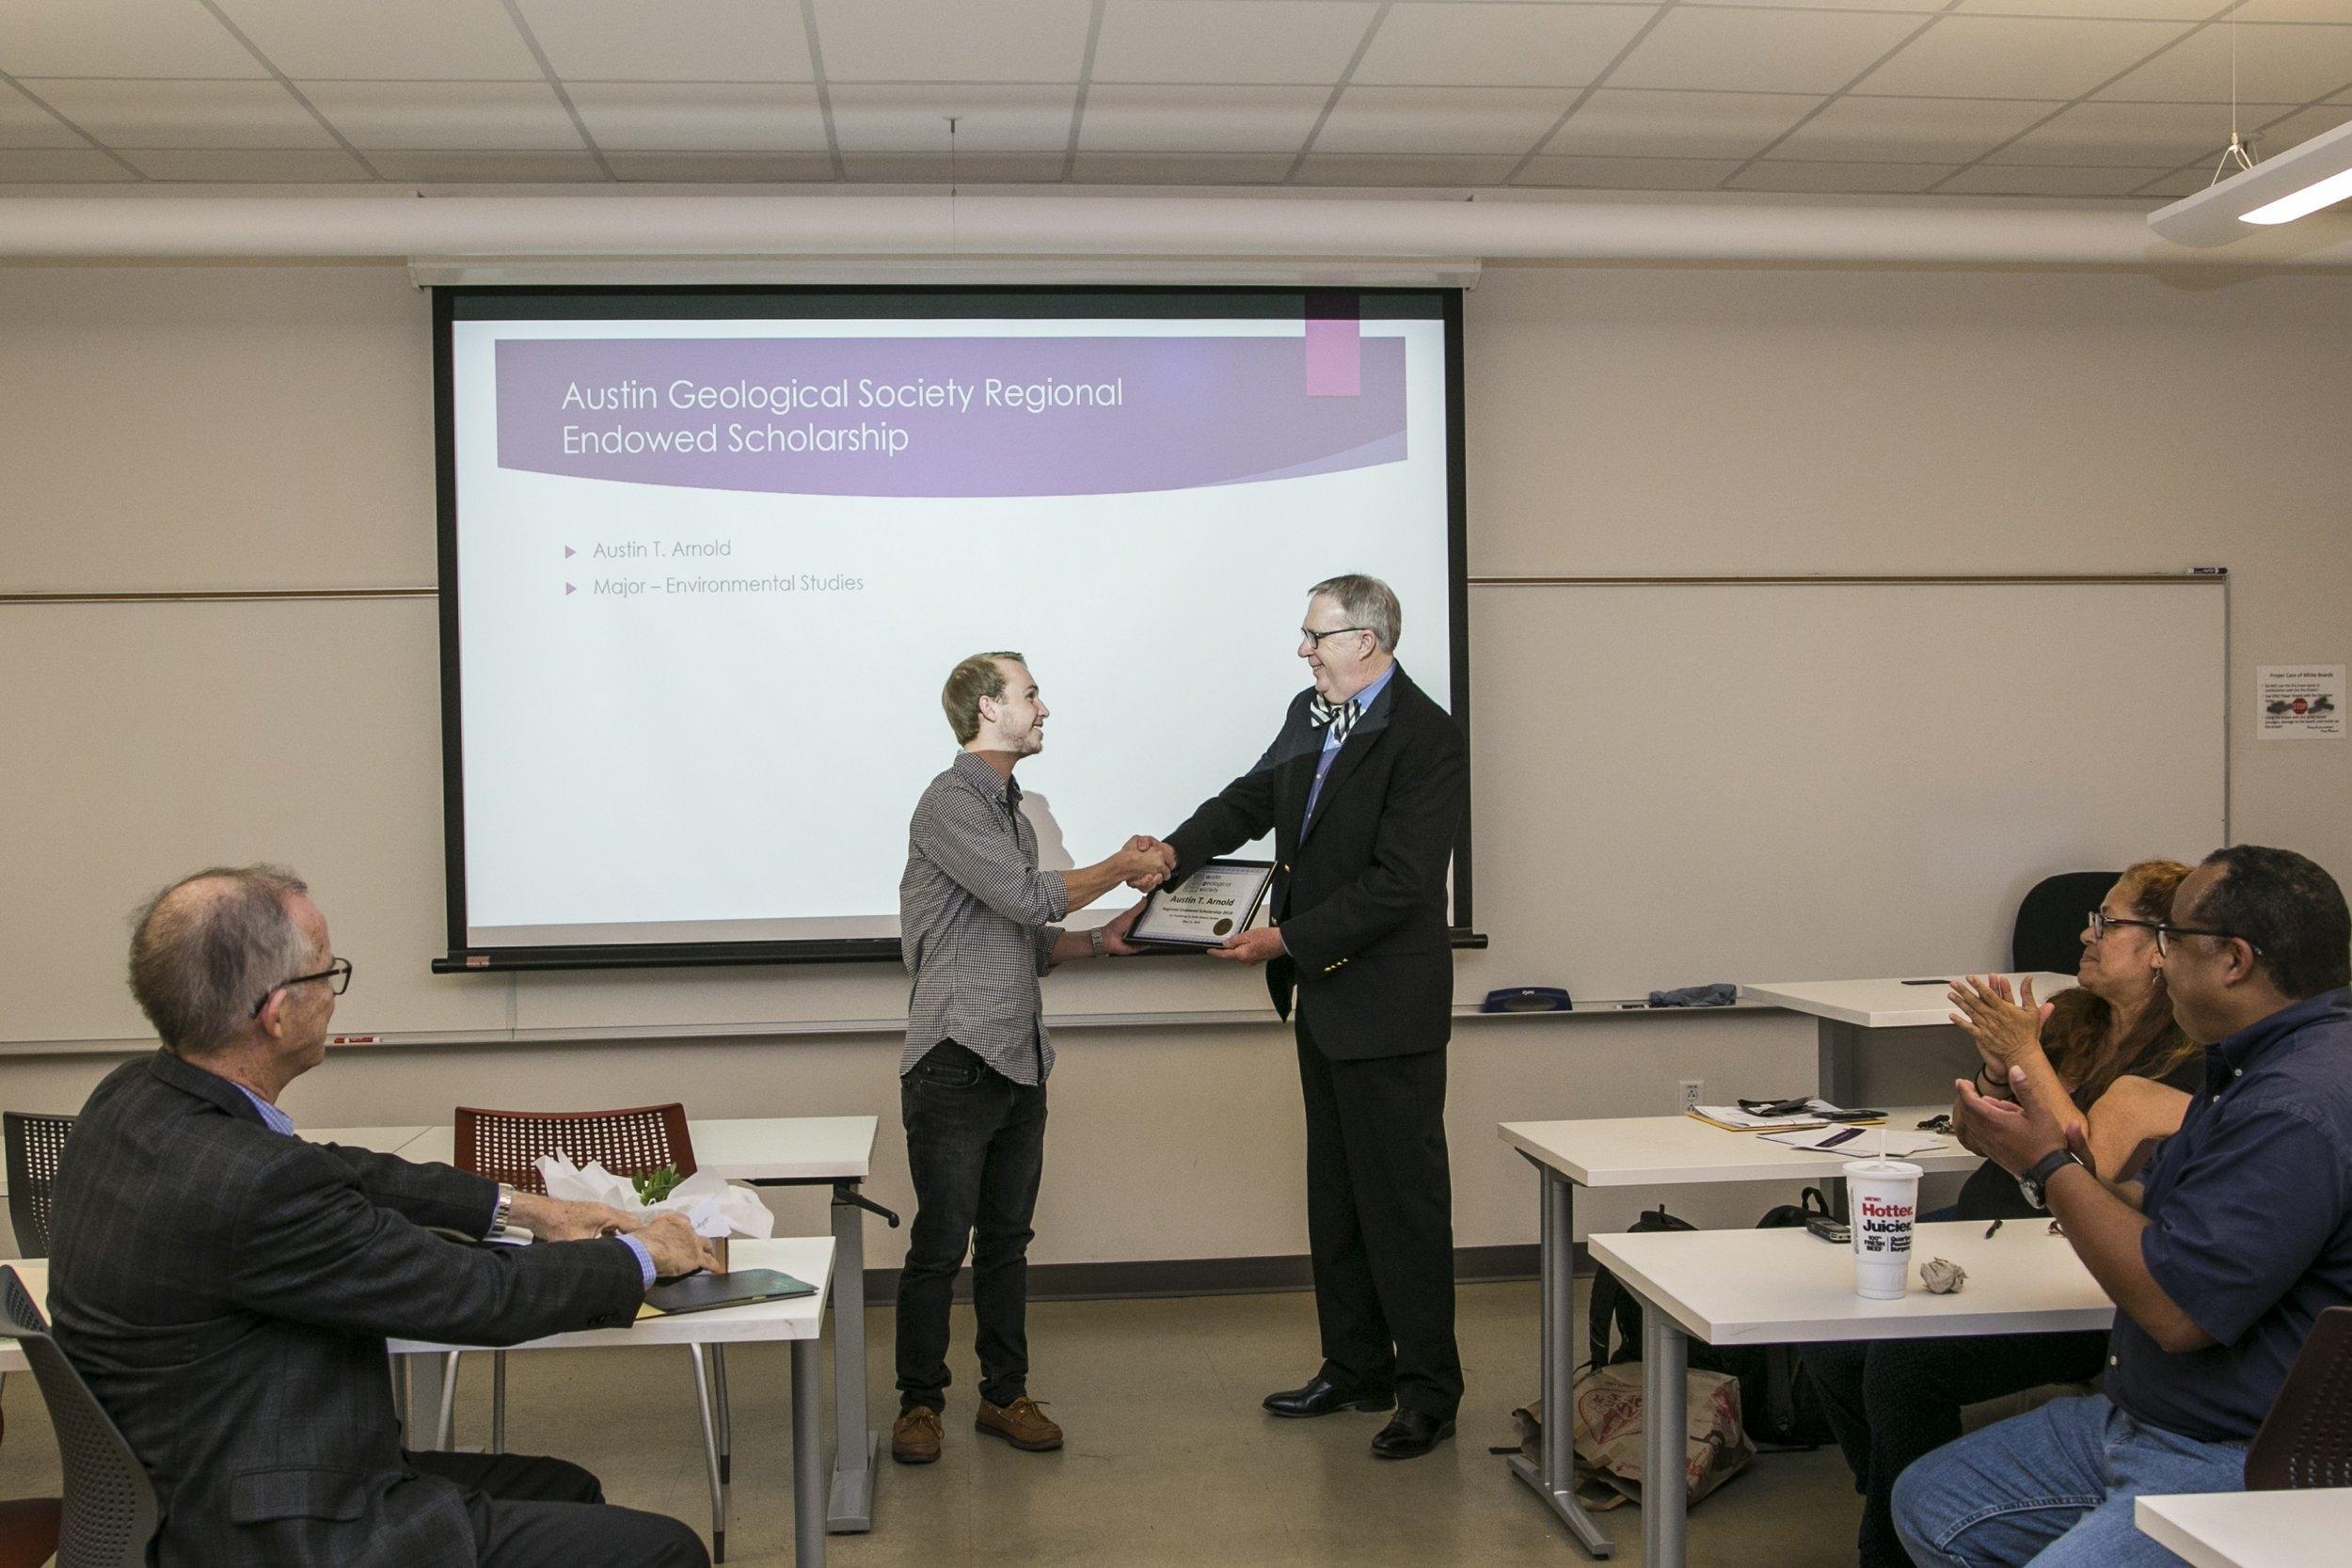 Austin Geological Society Regional Endowed Scholarship